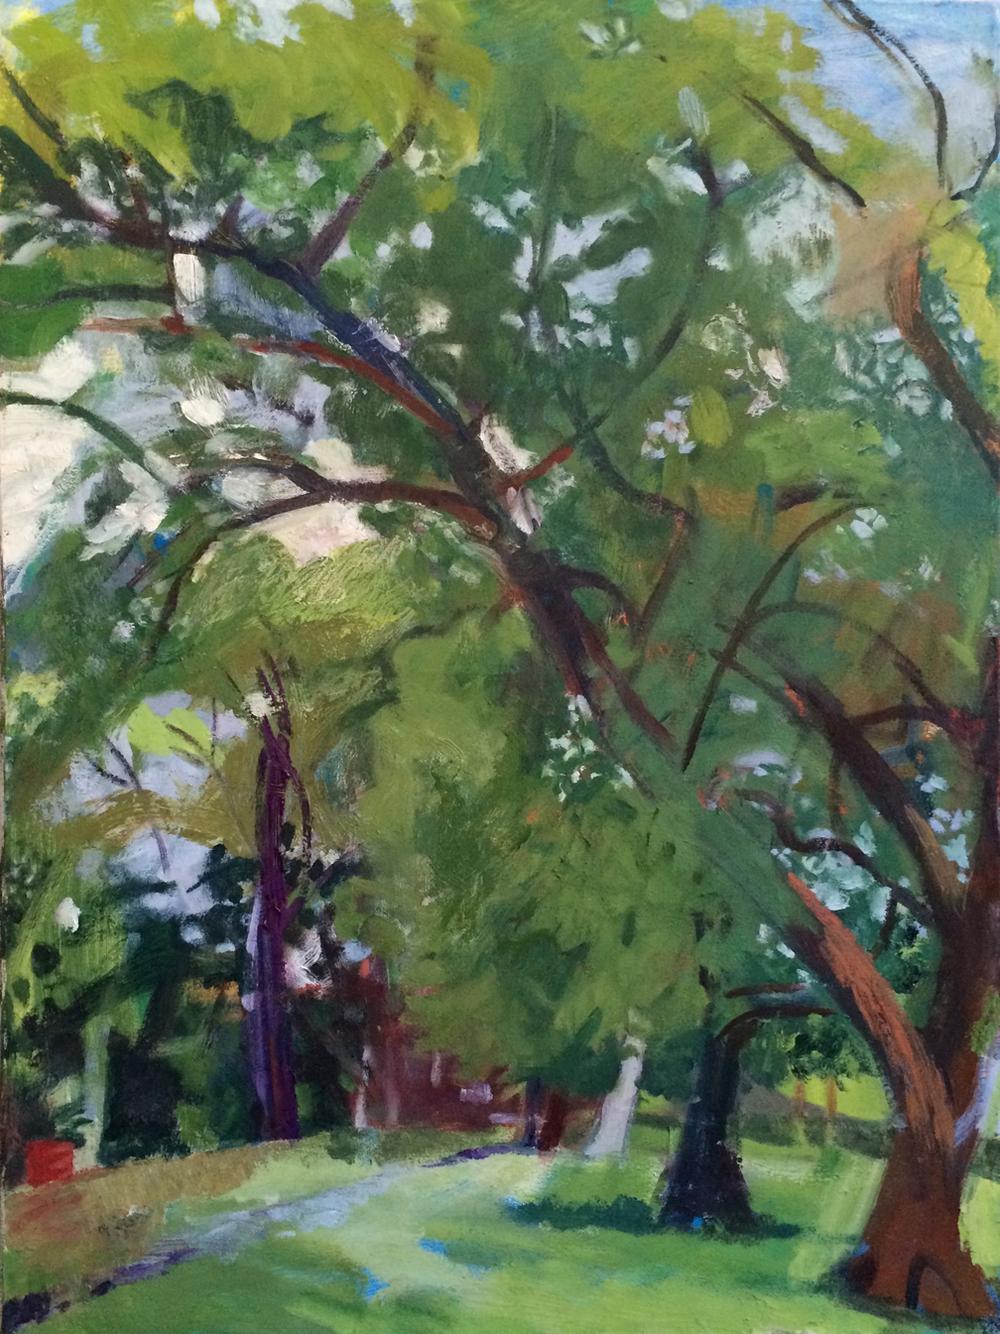 Humboldt Park - Diagonal Trees